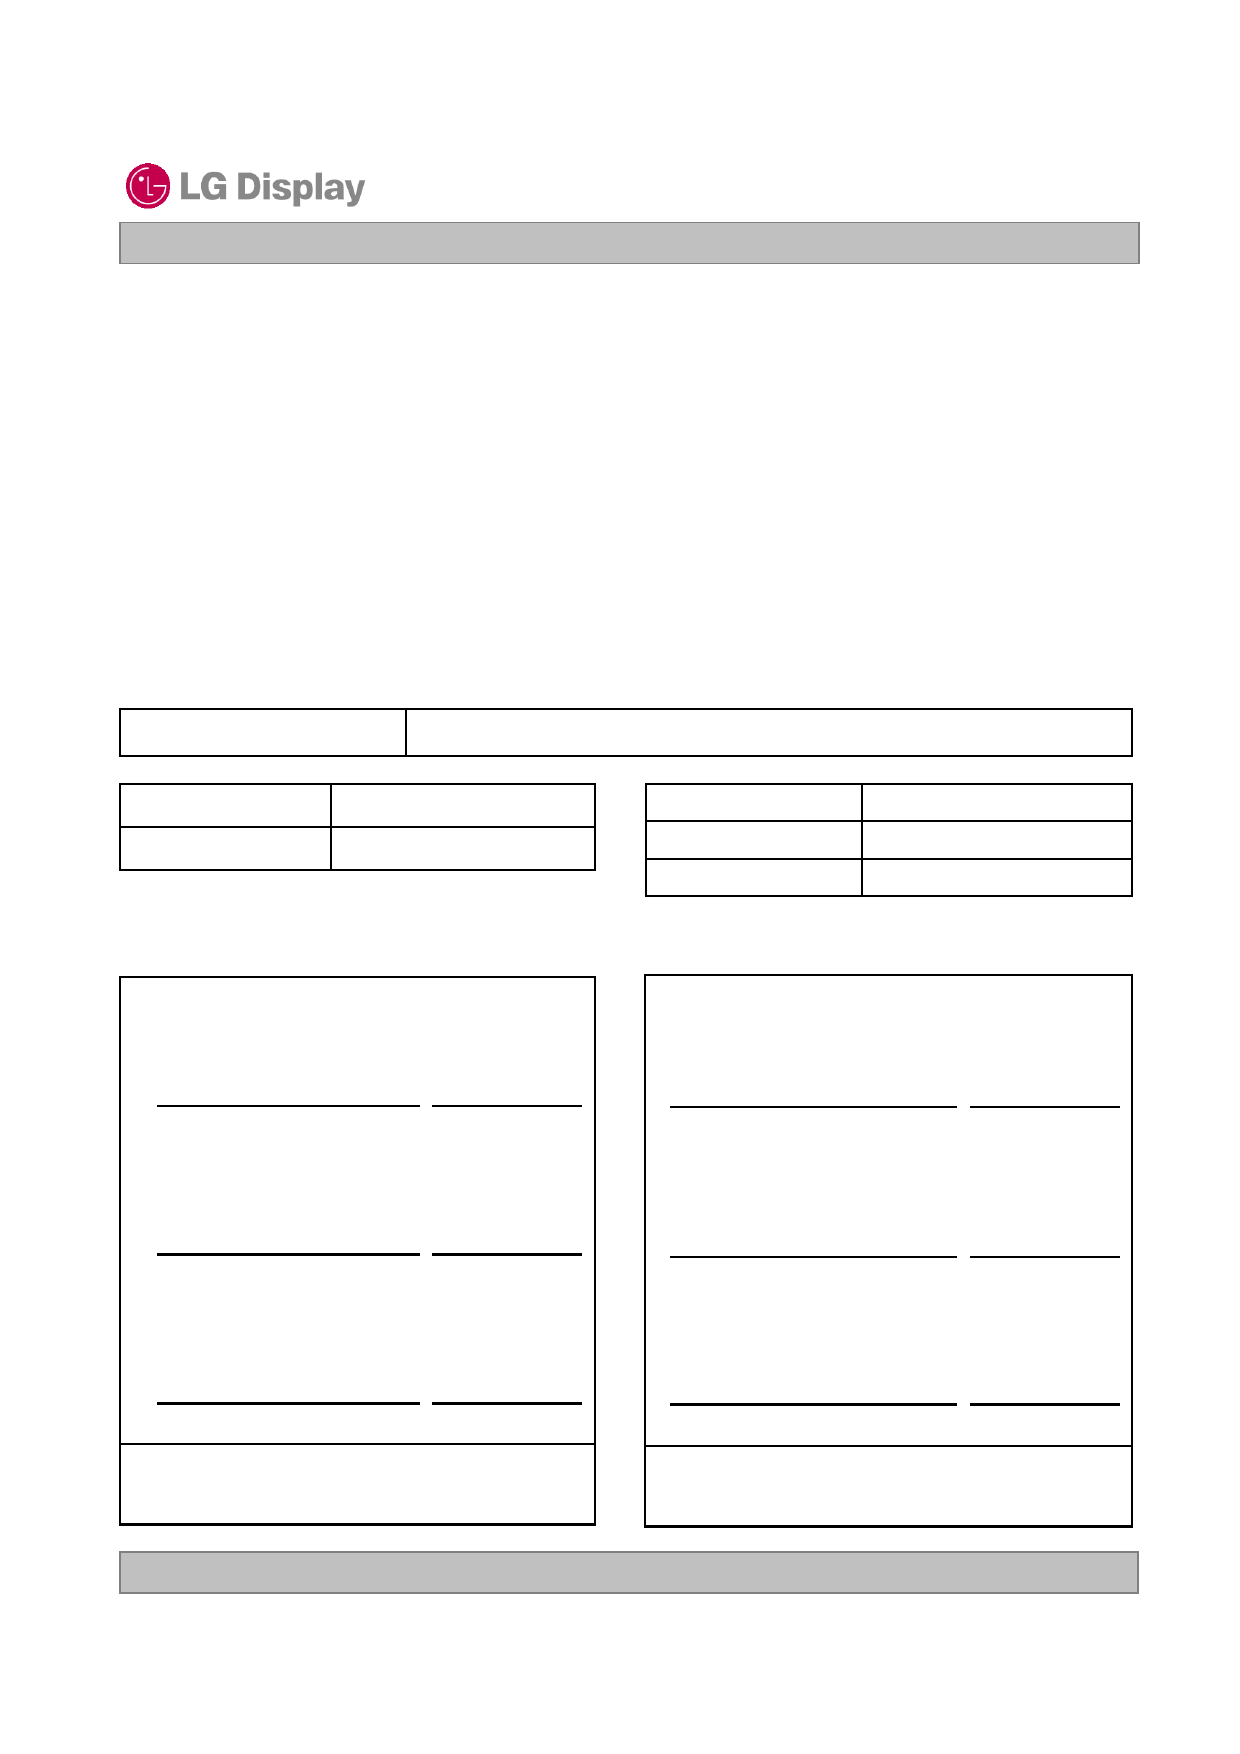 LC320EUN-SFM1 datasheet